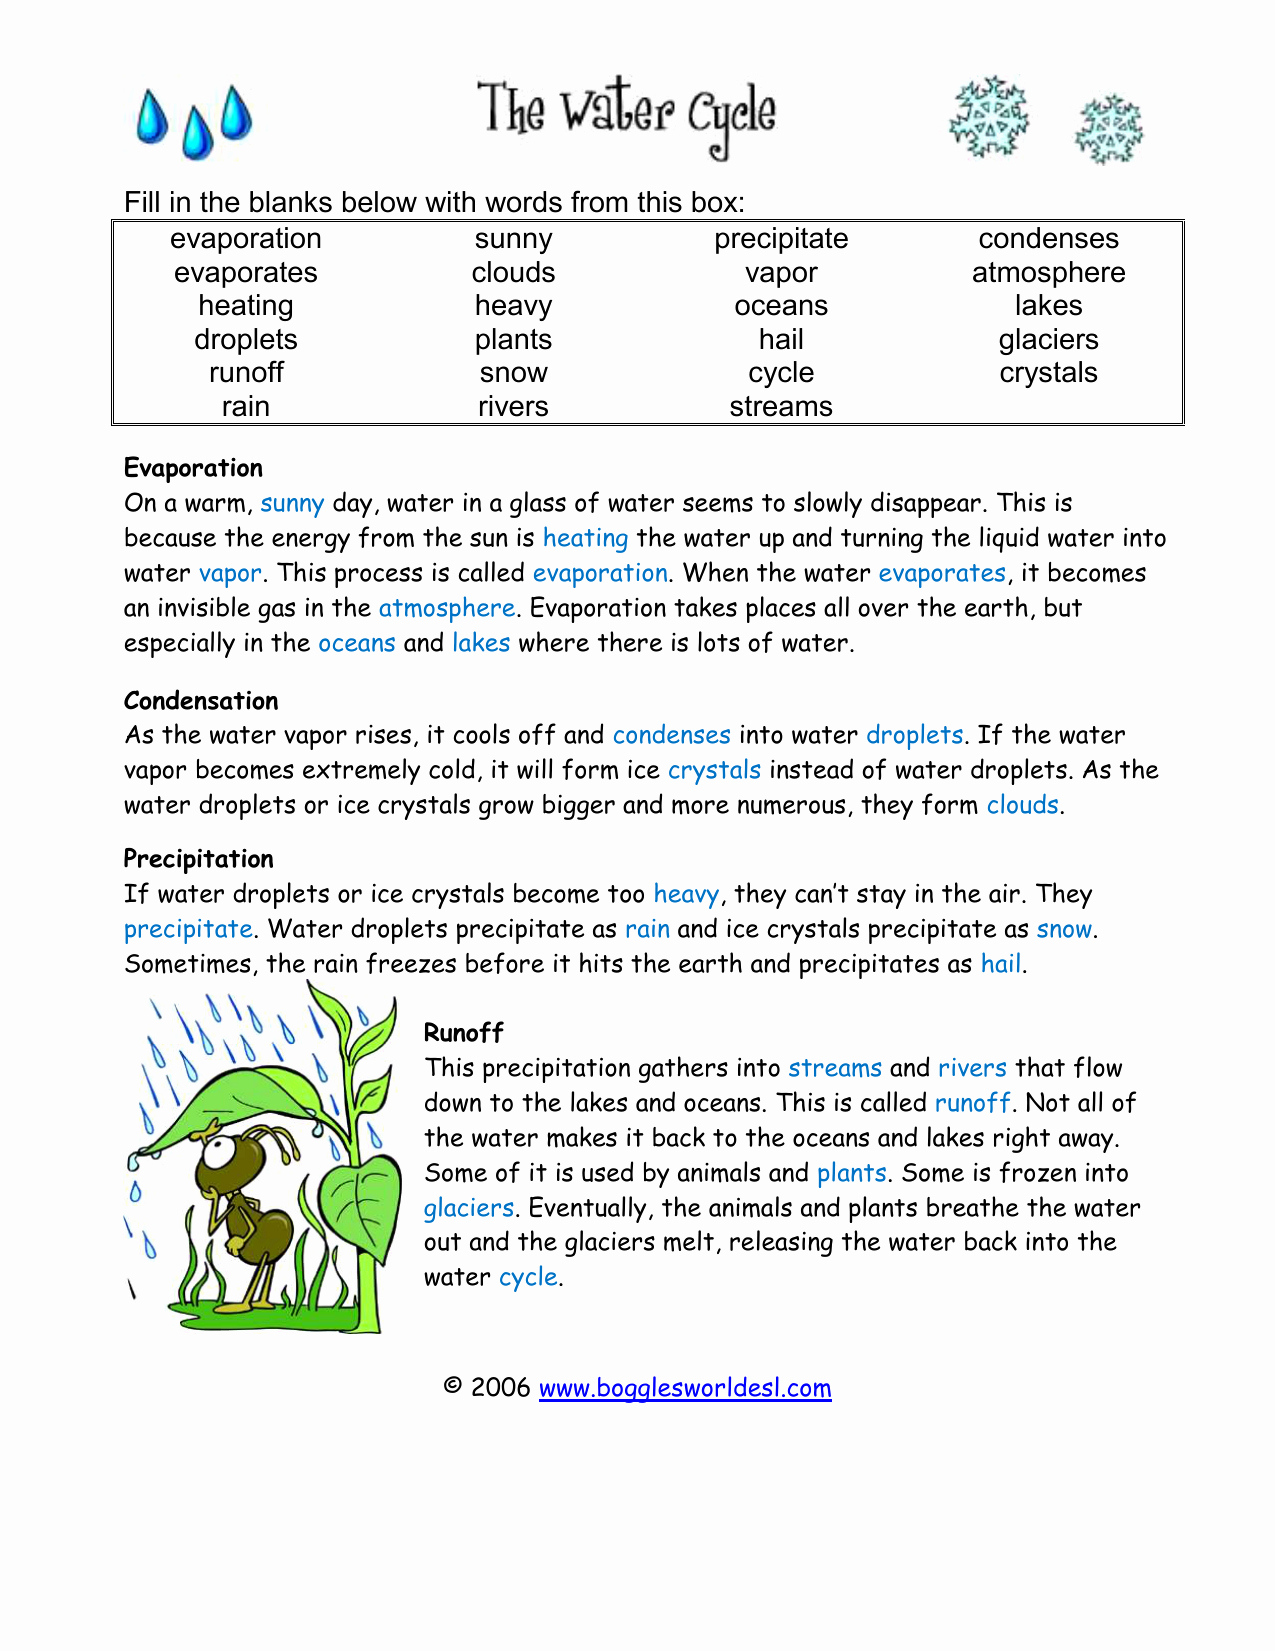 Water Cycle Worksheet Answer Key Elegant Water Cycle Worksheet Answer Key the Best Worksheets Image